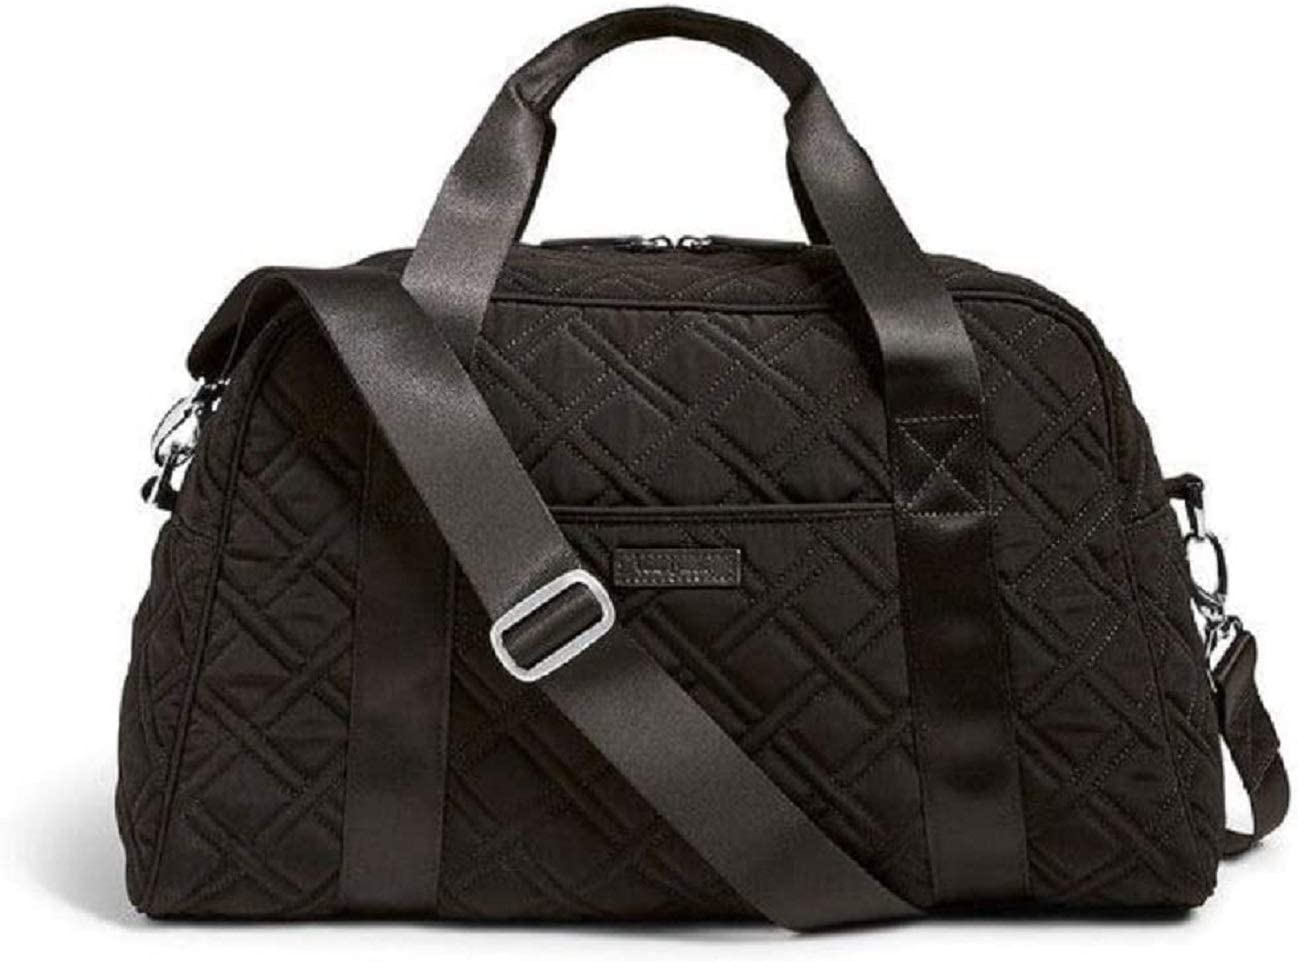 Womens designer gym bag Ladies designer sports bags sports holdall duffel  bag: Amazon.co.uk: Sports & Outdoors